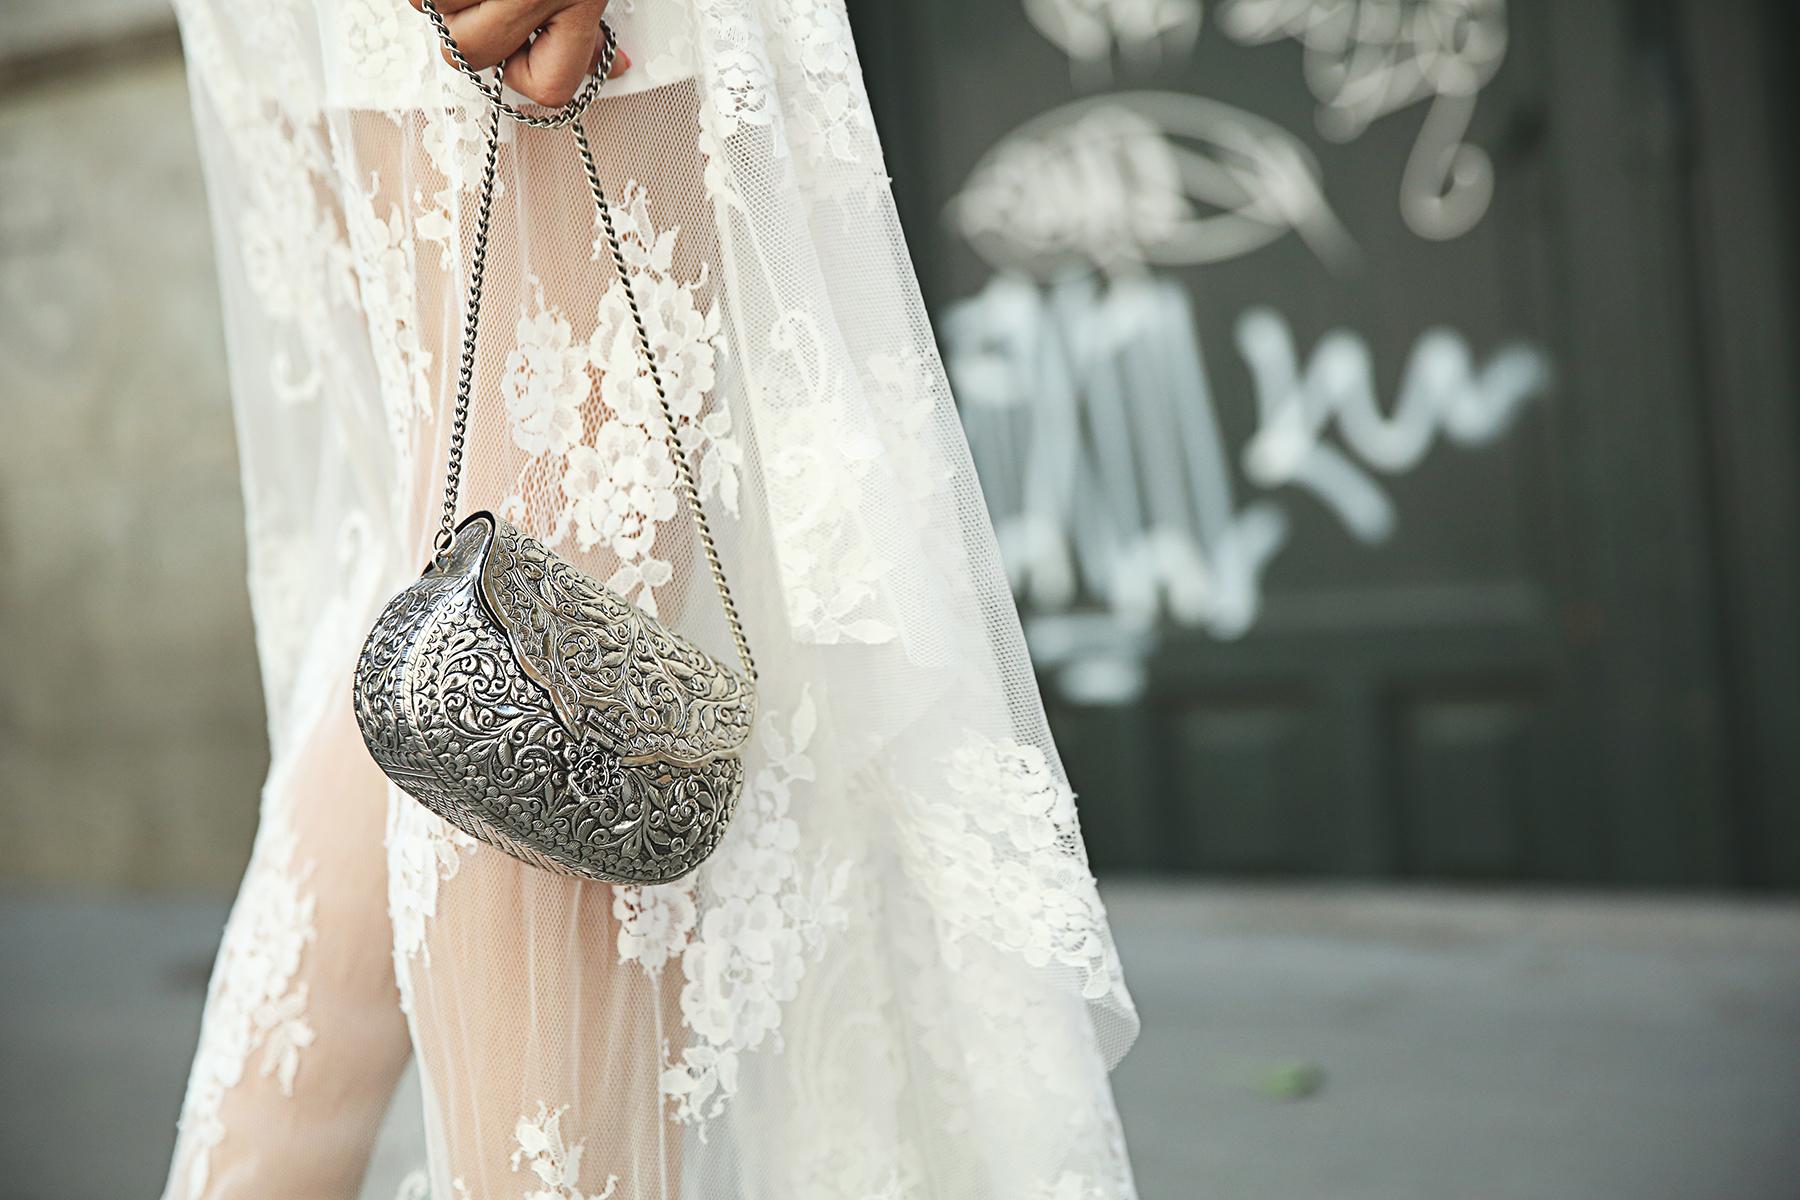 trendy-taste-look-outfit-street-style-ootd-blog-blogger-fashiopn-spain-moda-españa-magnum-juana-acosta-maje-11